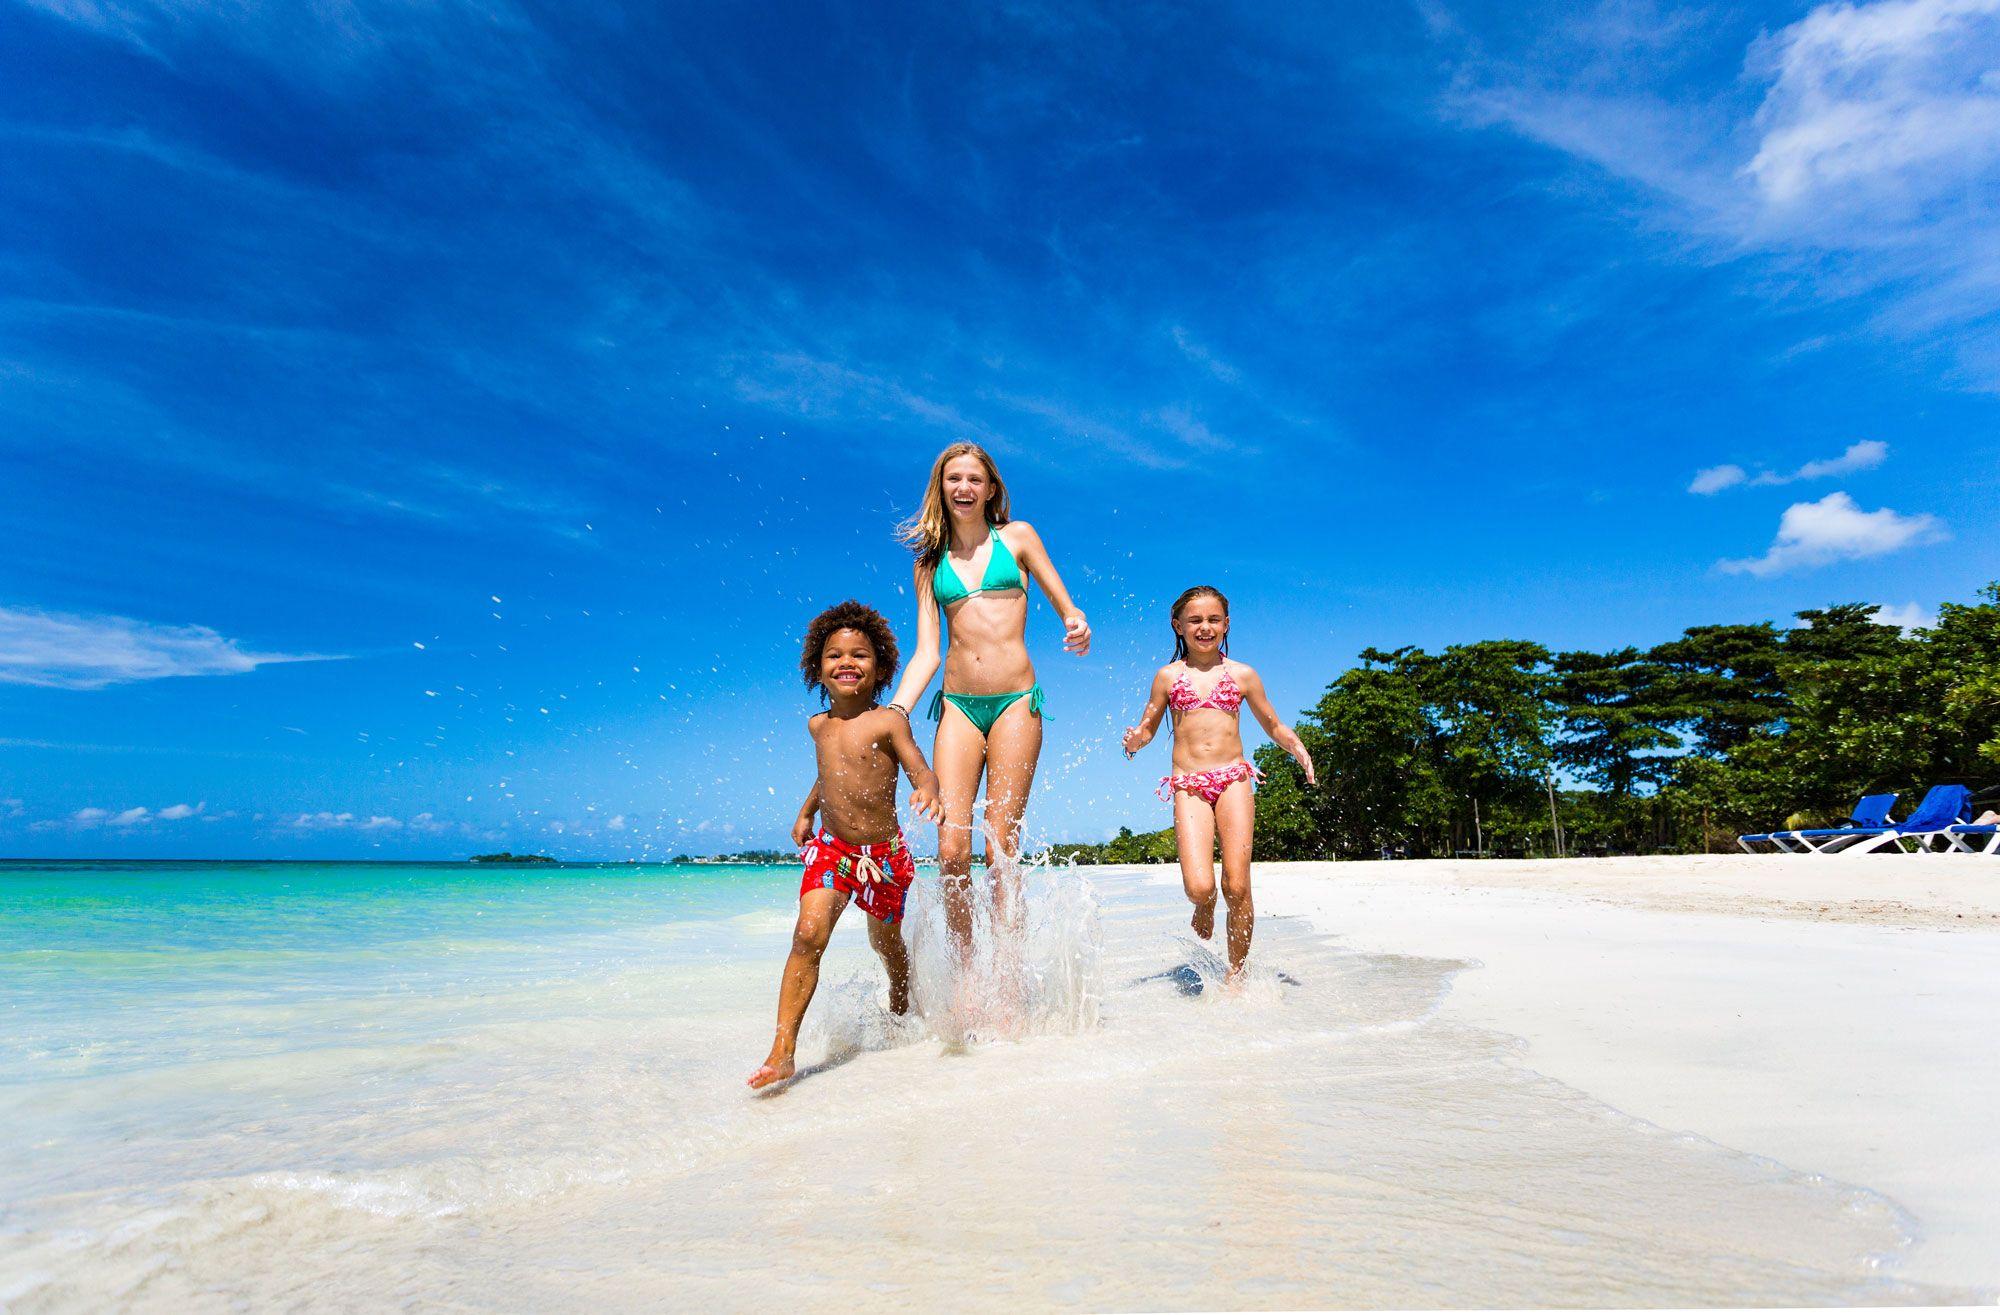 Seven Mile Beach, Negril: Best Beach in Jamaica | BEACHES